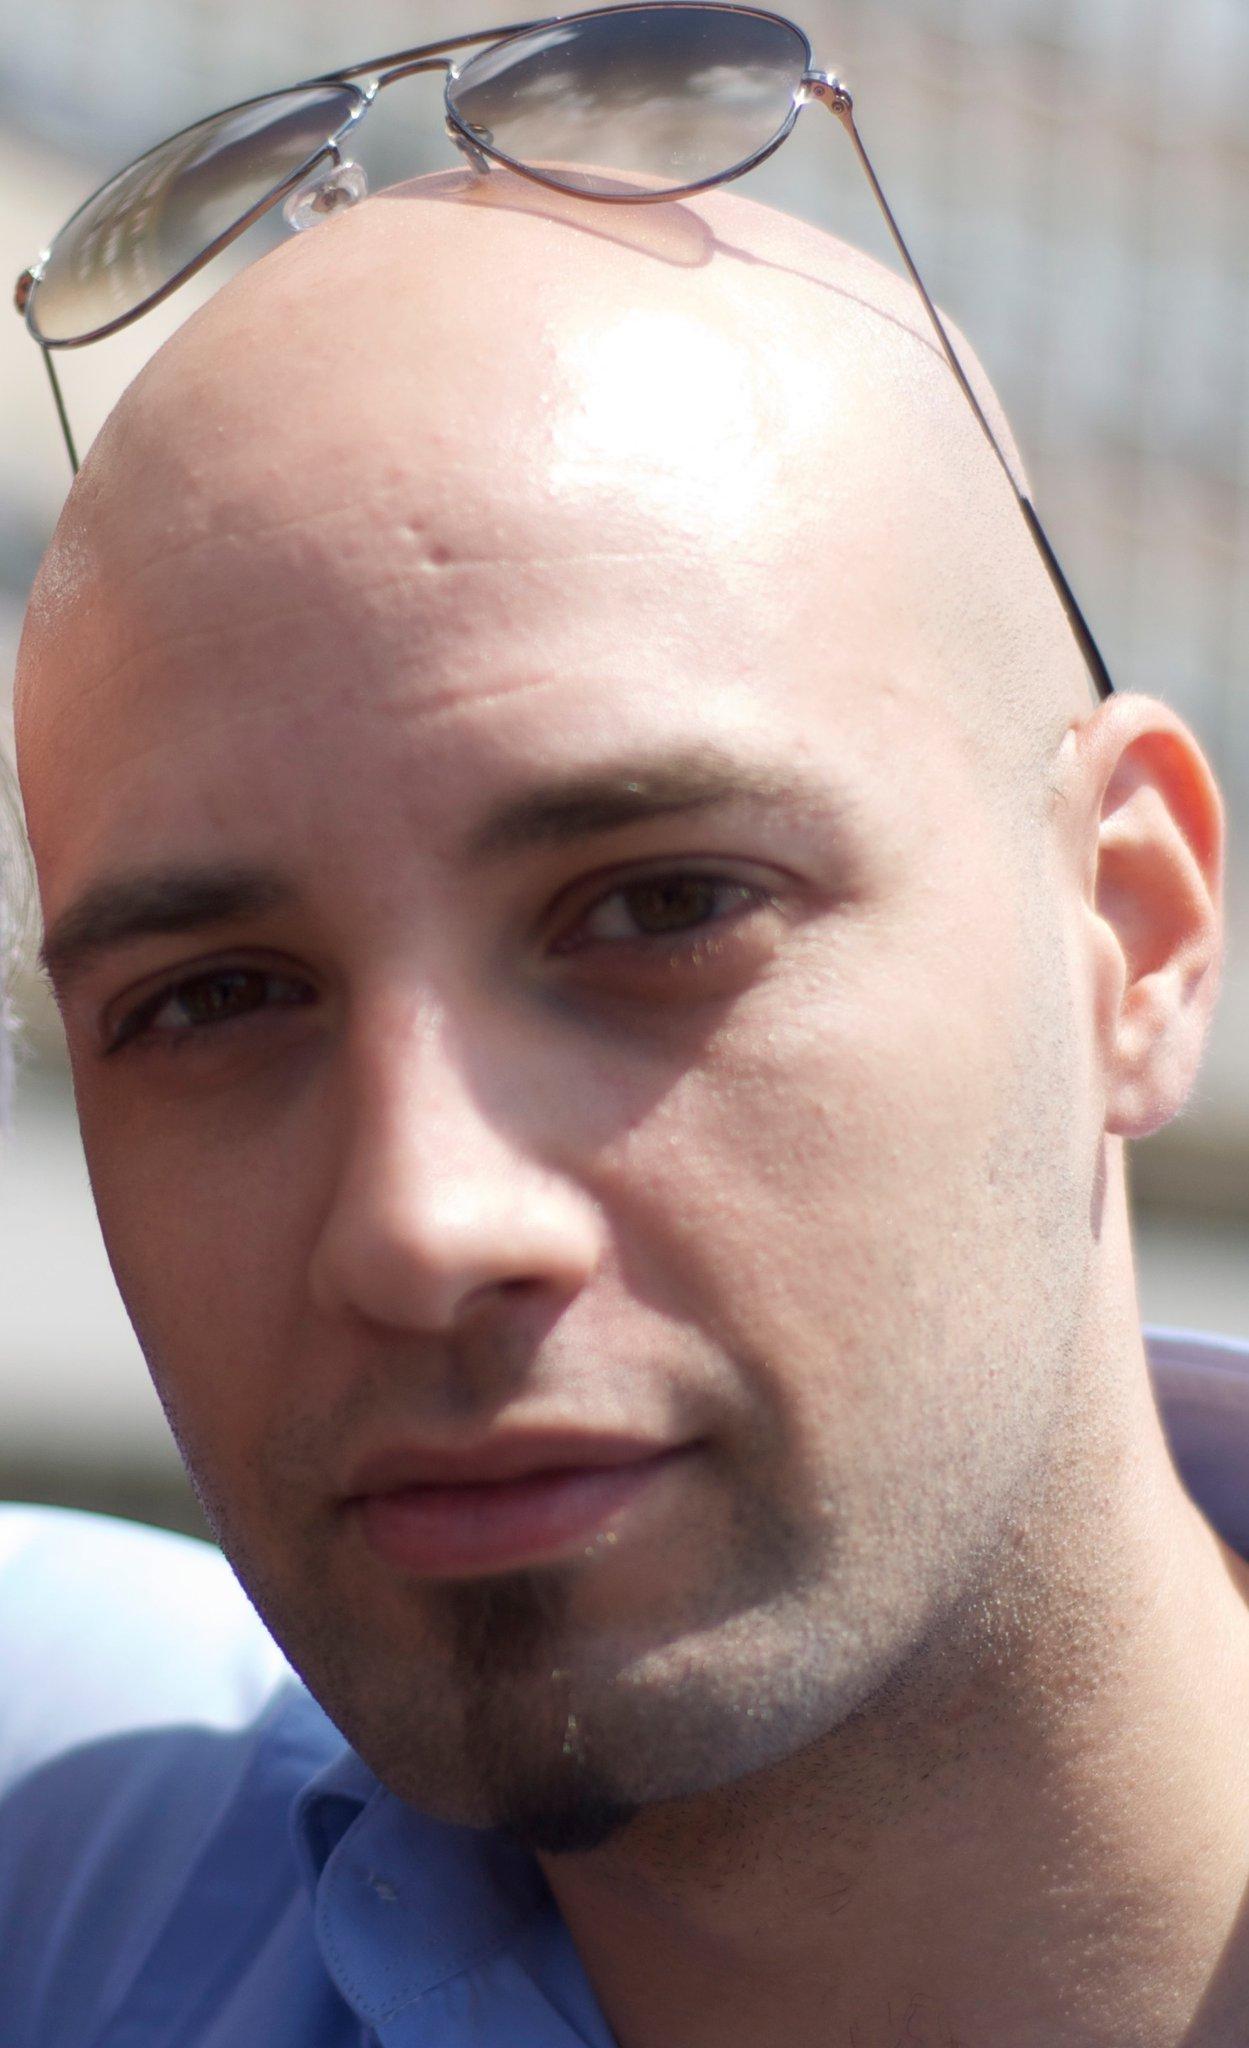 Pasquale Sada